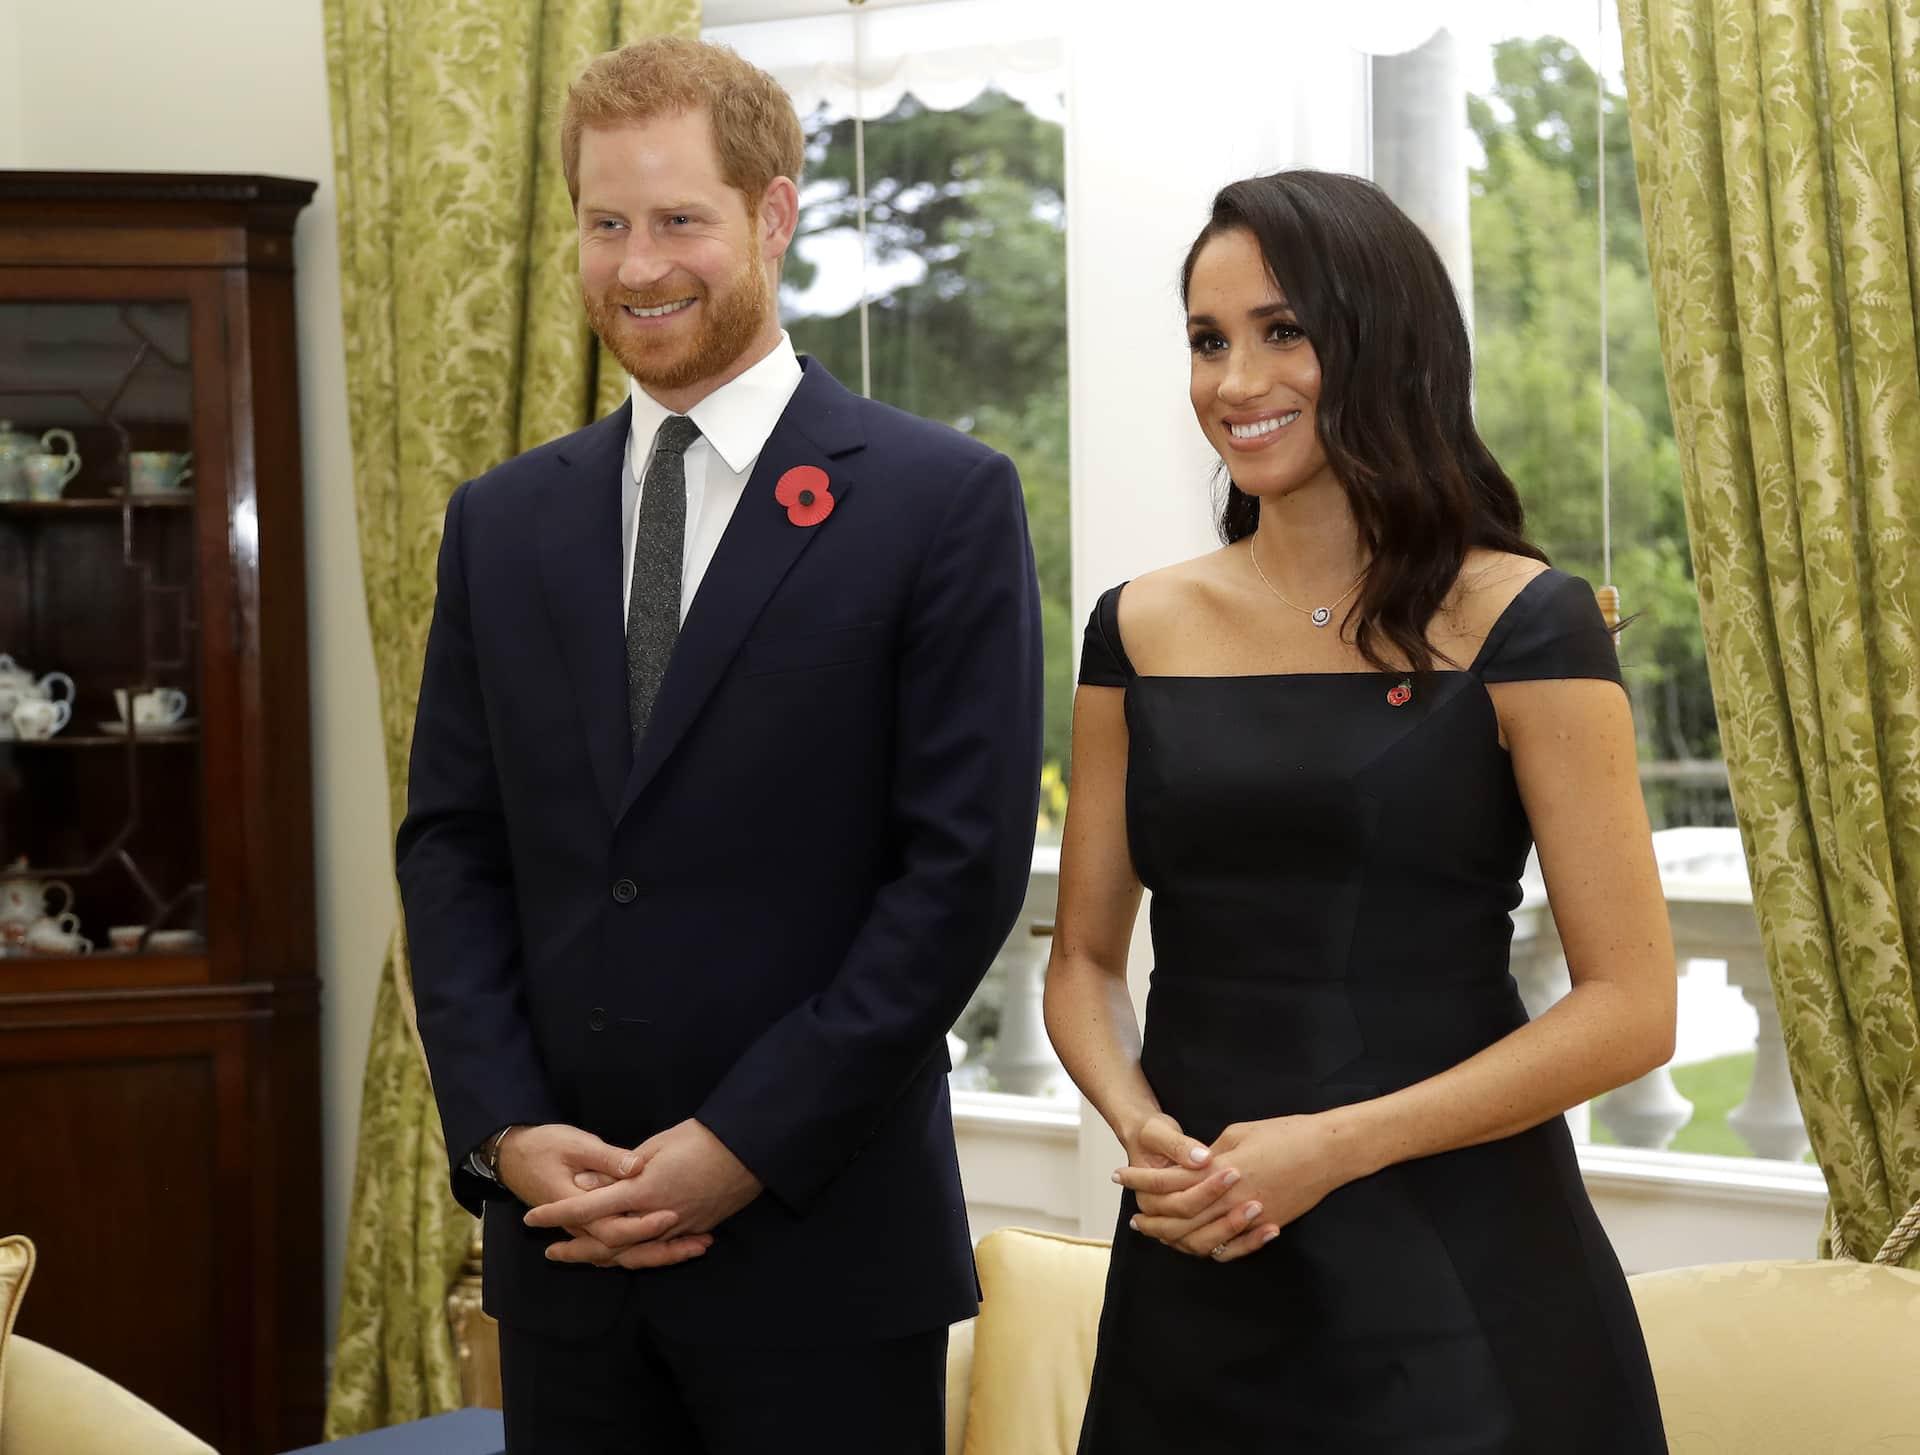 Herzogin Meghan und Prinz Harry: Umzug nach Neuseeland?